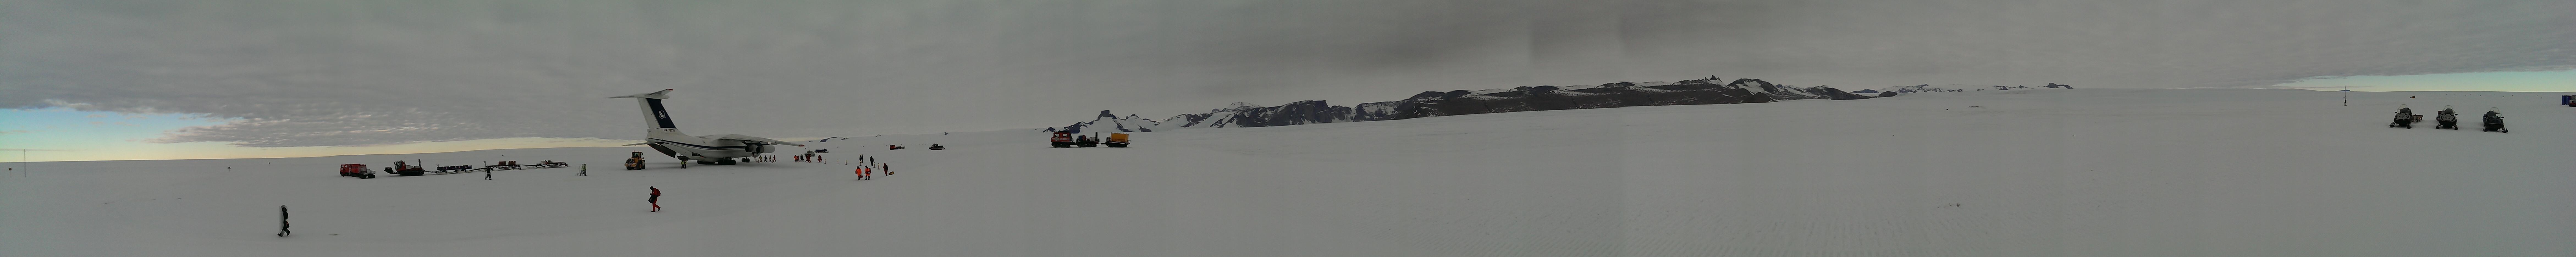 Panoramablick vom Flugfeld Troll